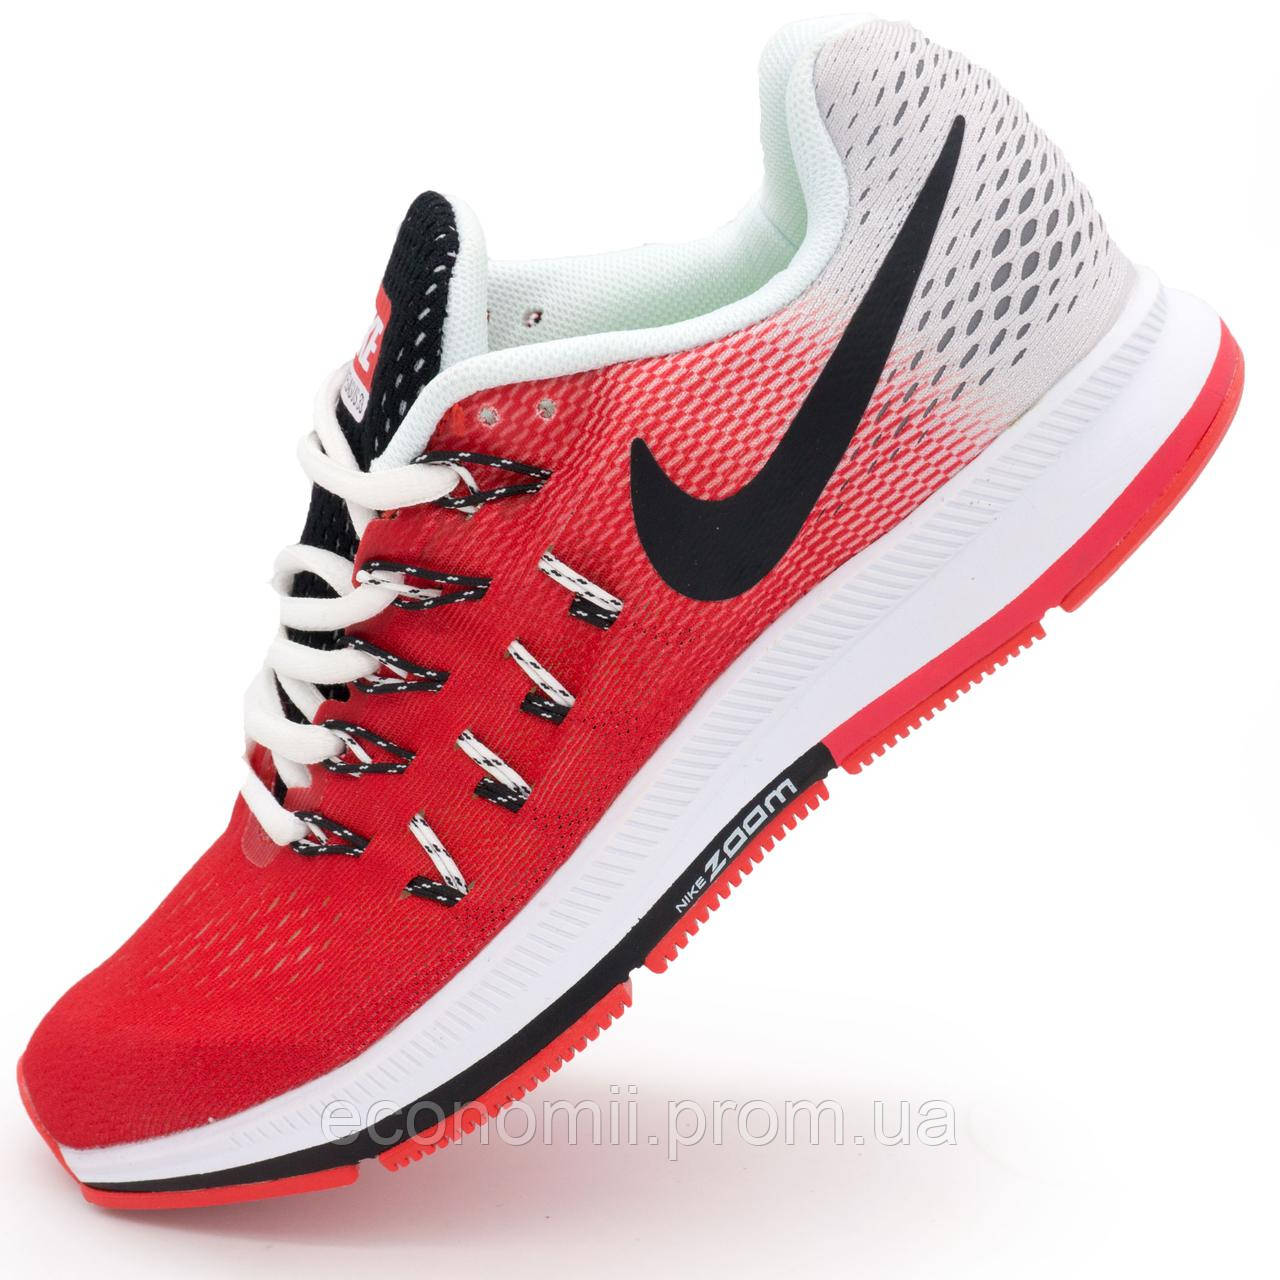 sports shoes 8265d f2e78 Женские кроссовки для бега Nike Zoom Pegasus 33 красные. Топ качество! -  Реплика р.(38)